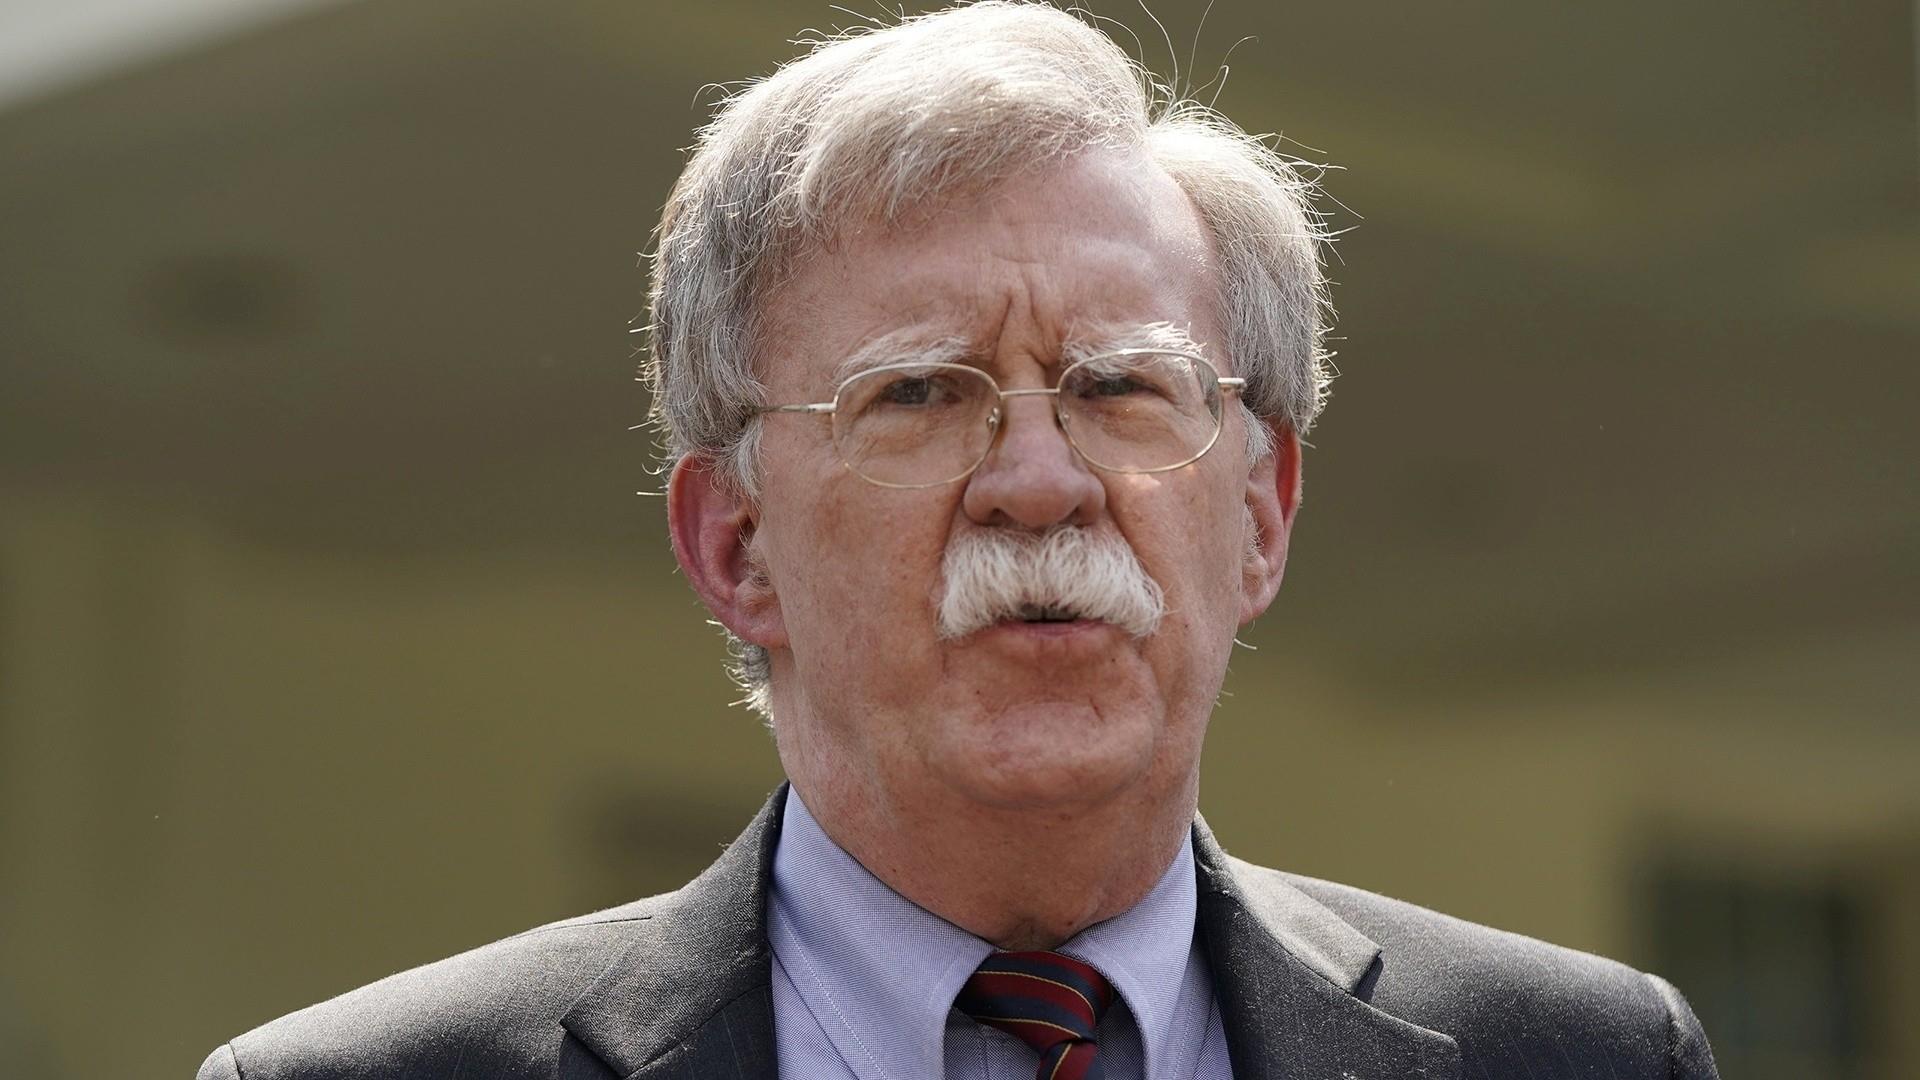 Democrats demand Bolton testify after report his book says Trump tied Ukraine aid to Biden probe